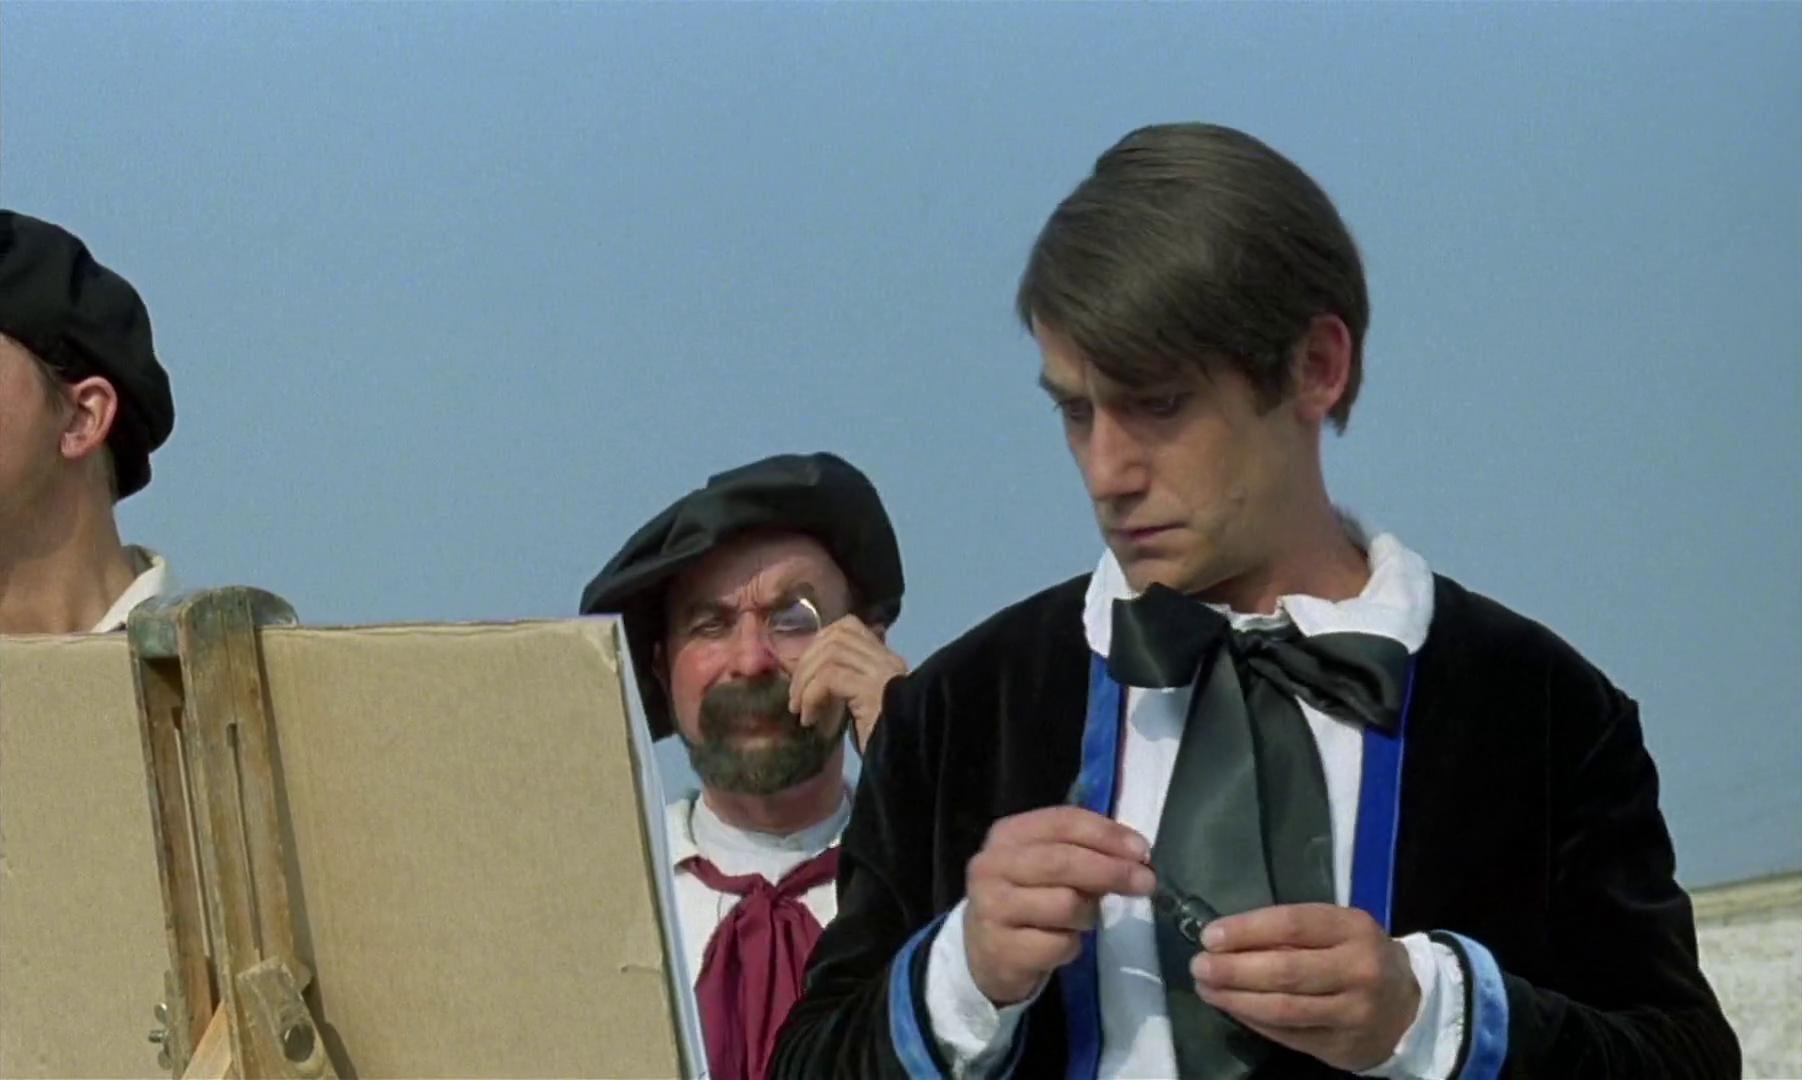 悠悠MP4_MP4电影下载_毕加索的奇异旅程 The.Adventures.of.Picasso.1978.SWEDISH.1080p.WEBRip.x264-VXT 2.15GB